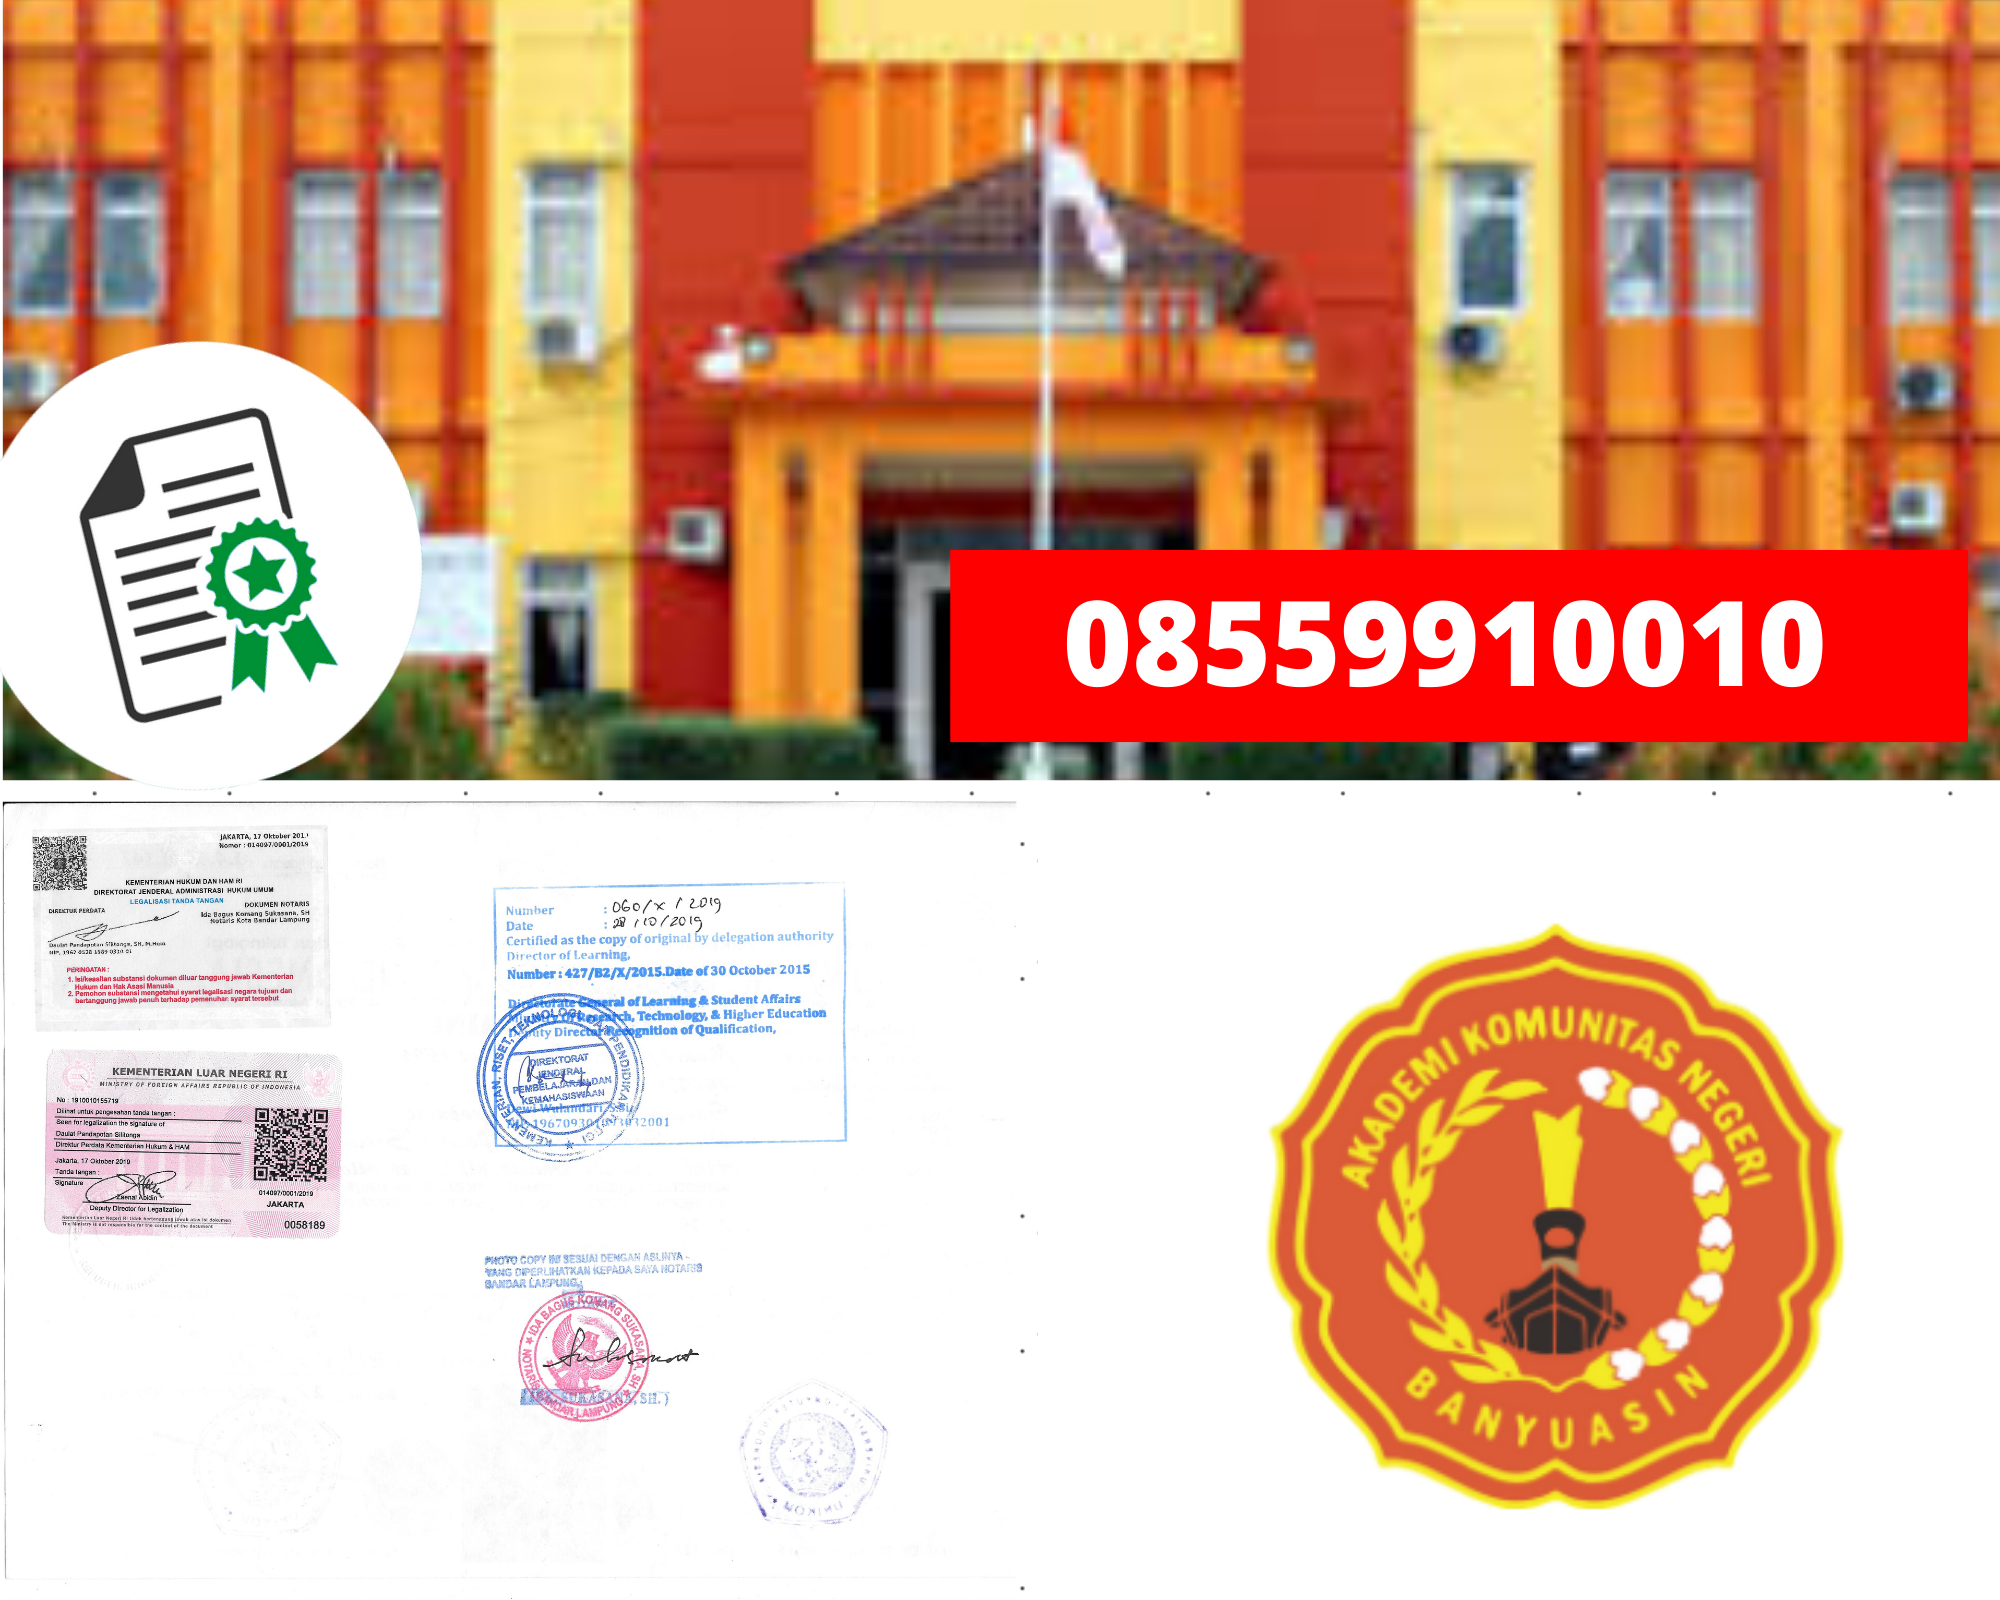 Legalisir Ijazah Akademi Komunitas Negeri Banyuasin Di Kemenristek Dikti || 08559910010